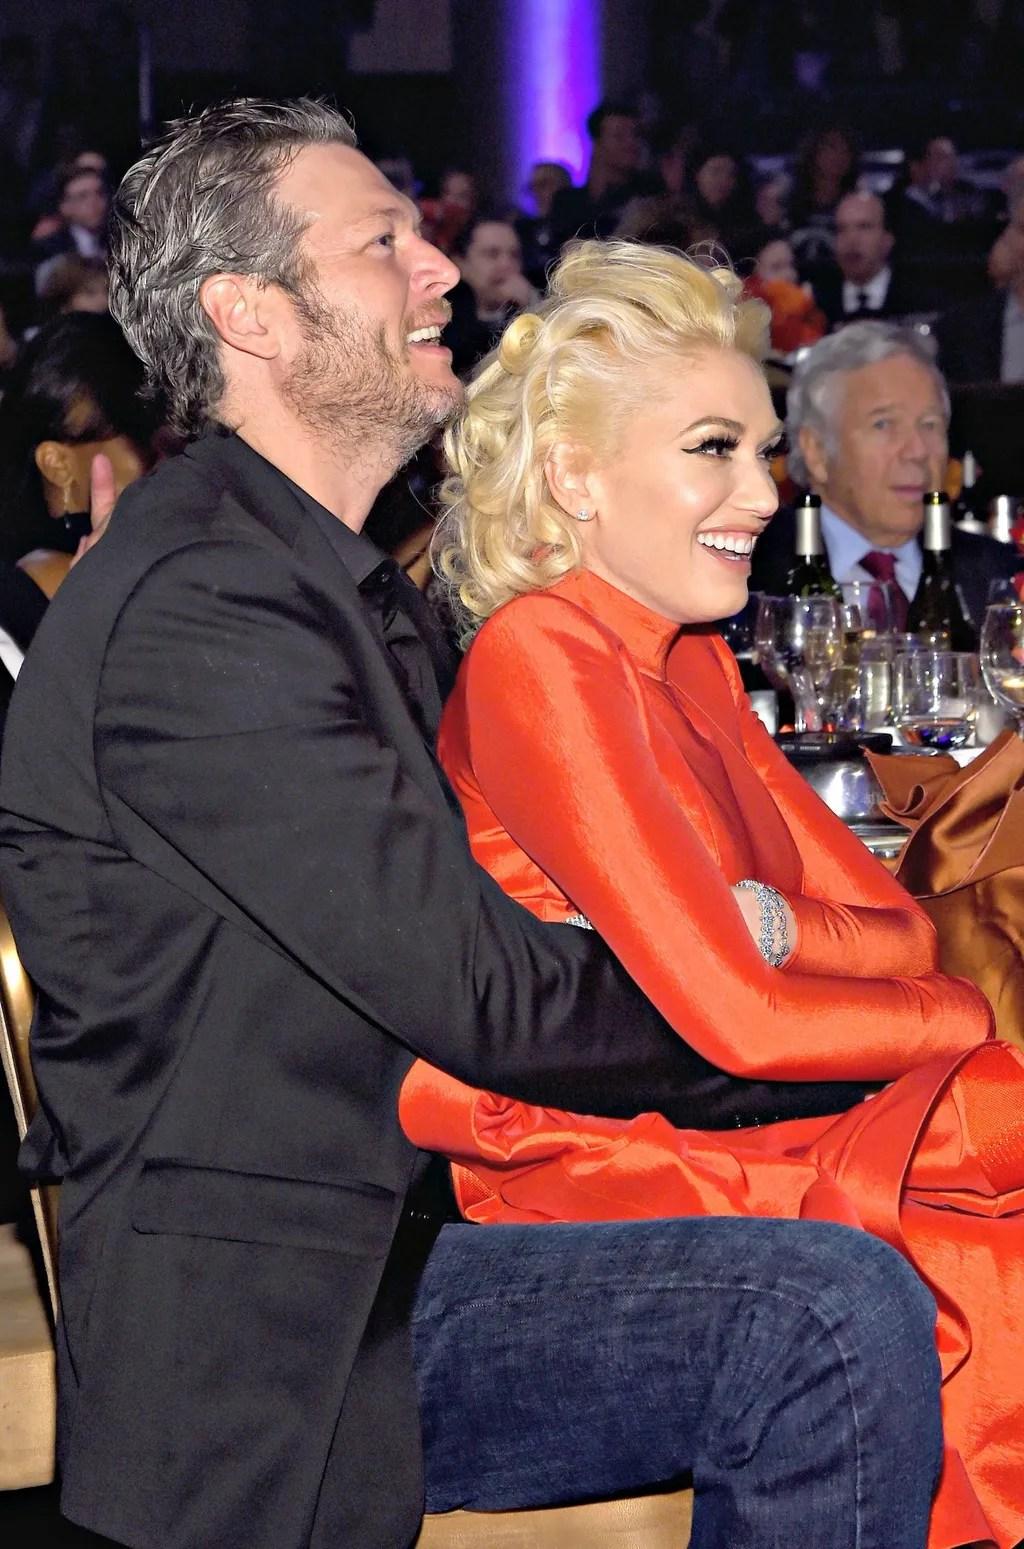 Photos Blake Shelton And Gwen Stefani Get Cozy At Clive